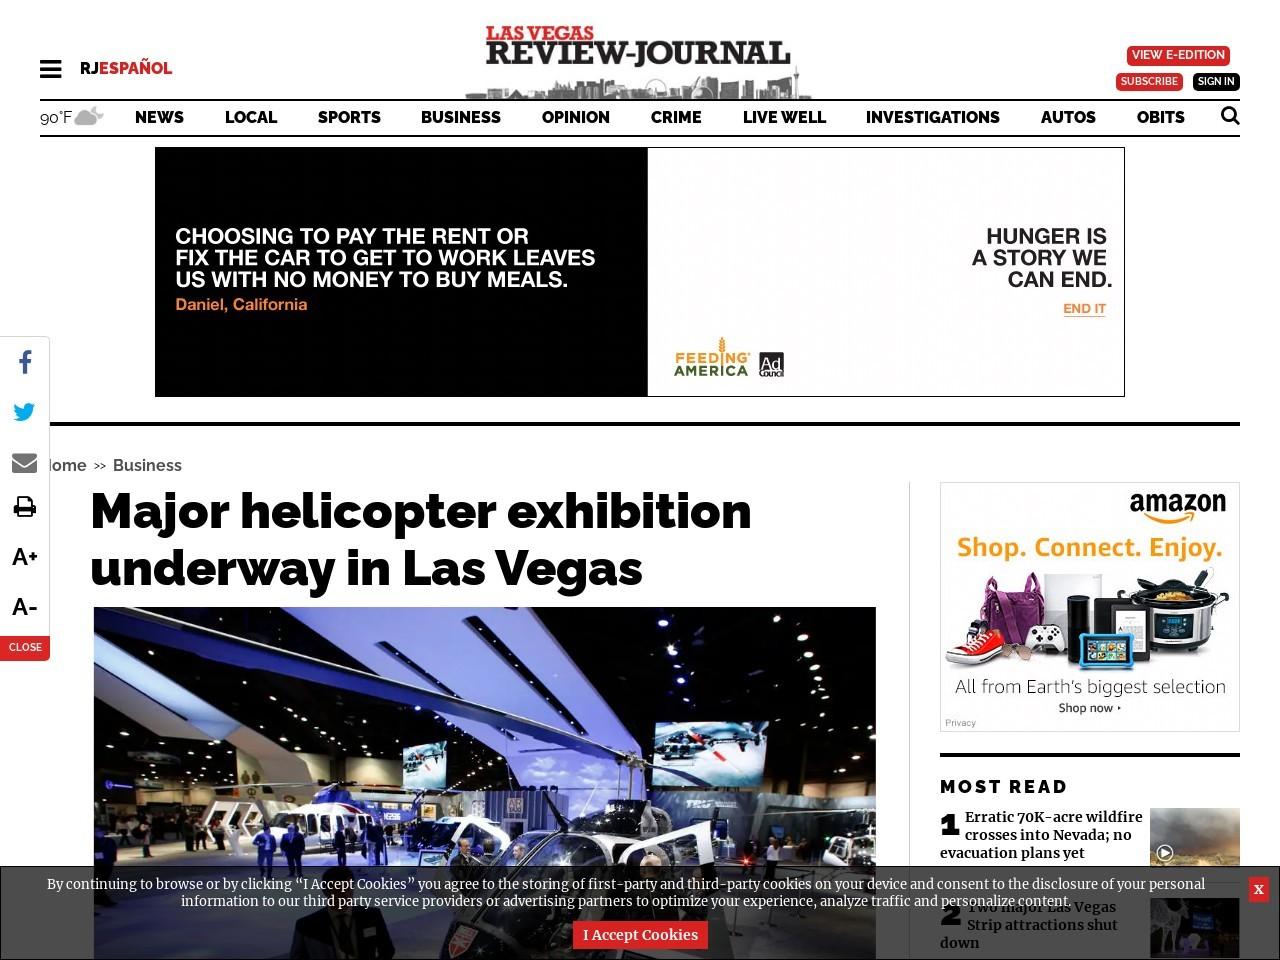 Major helicopter exhibition underway in Las Vegas